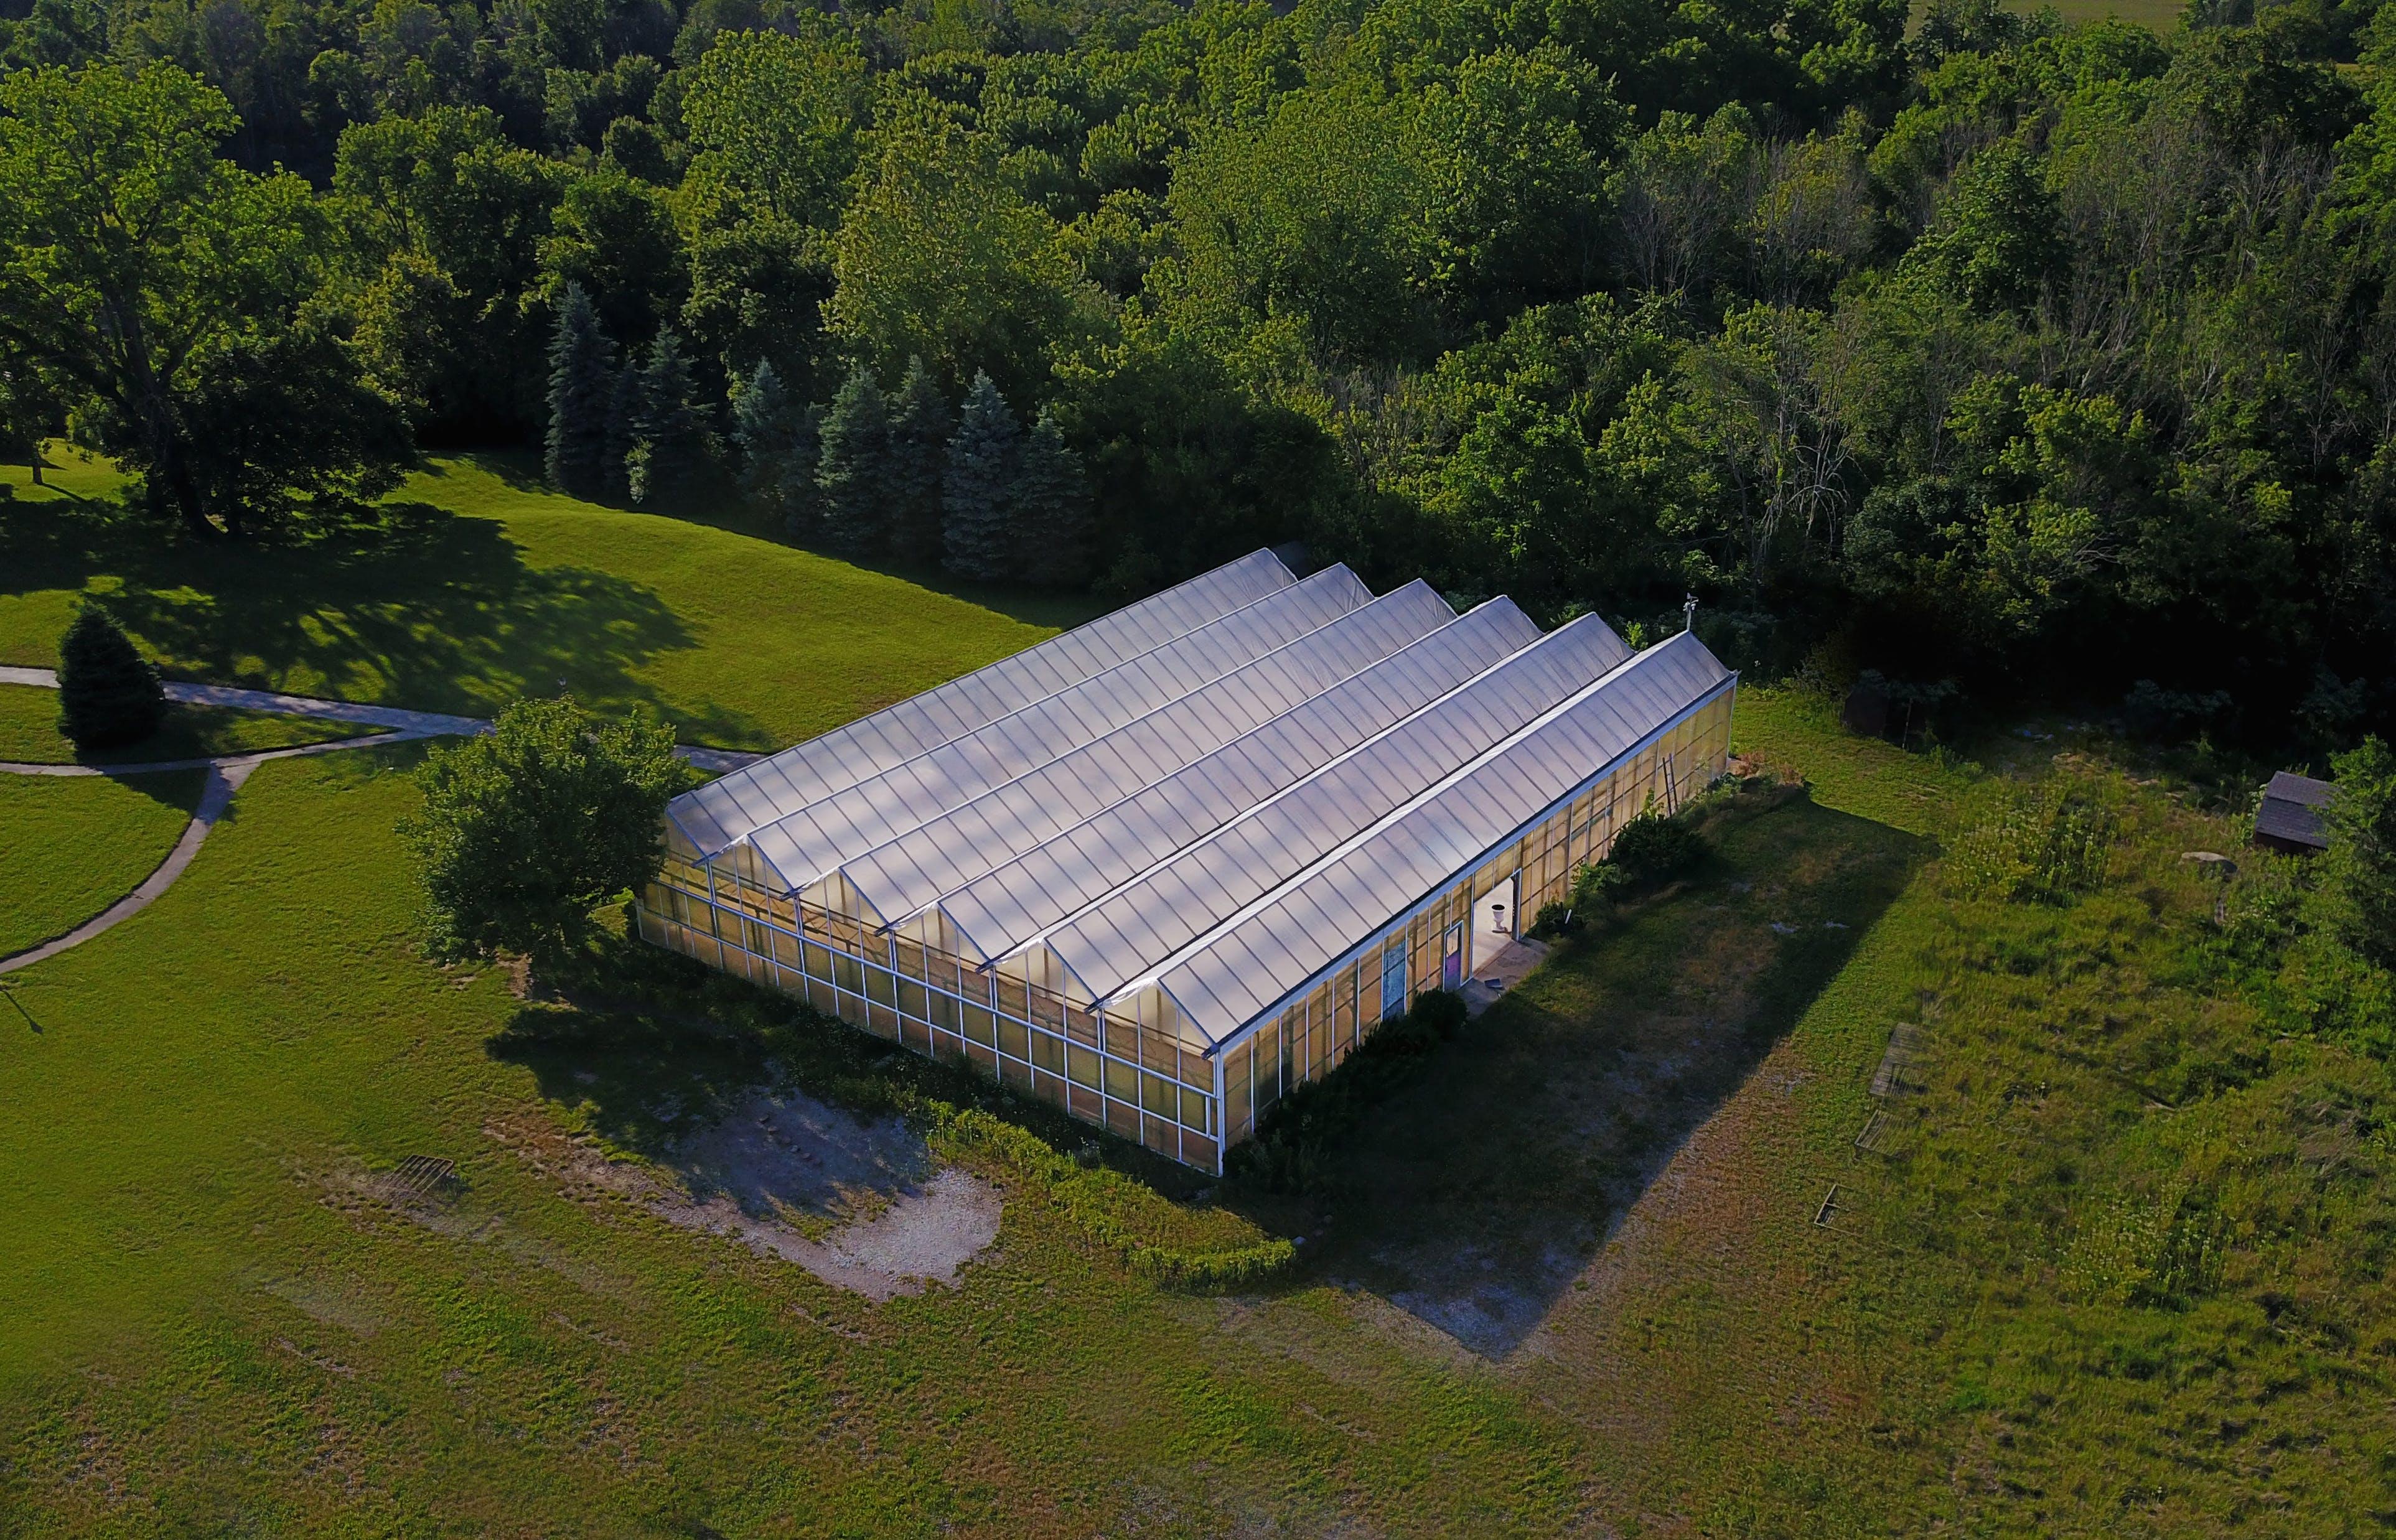 Free stock photo of Greenhouse ariel